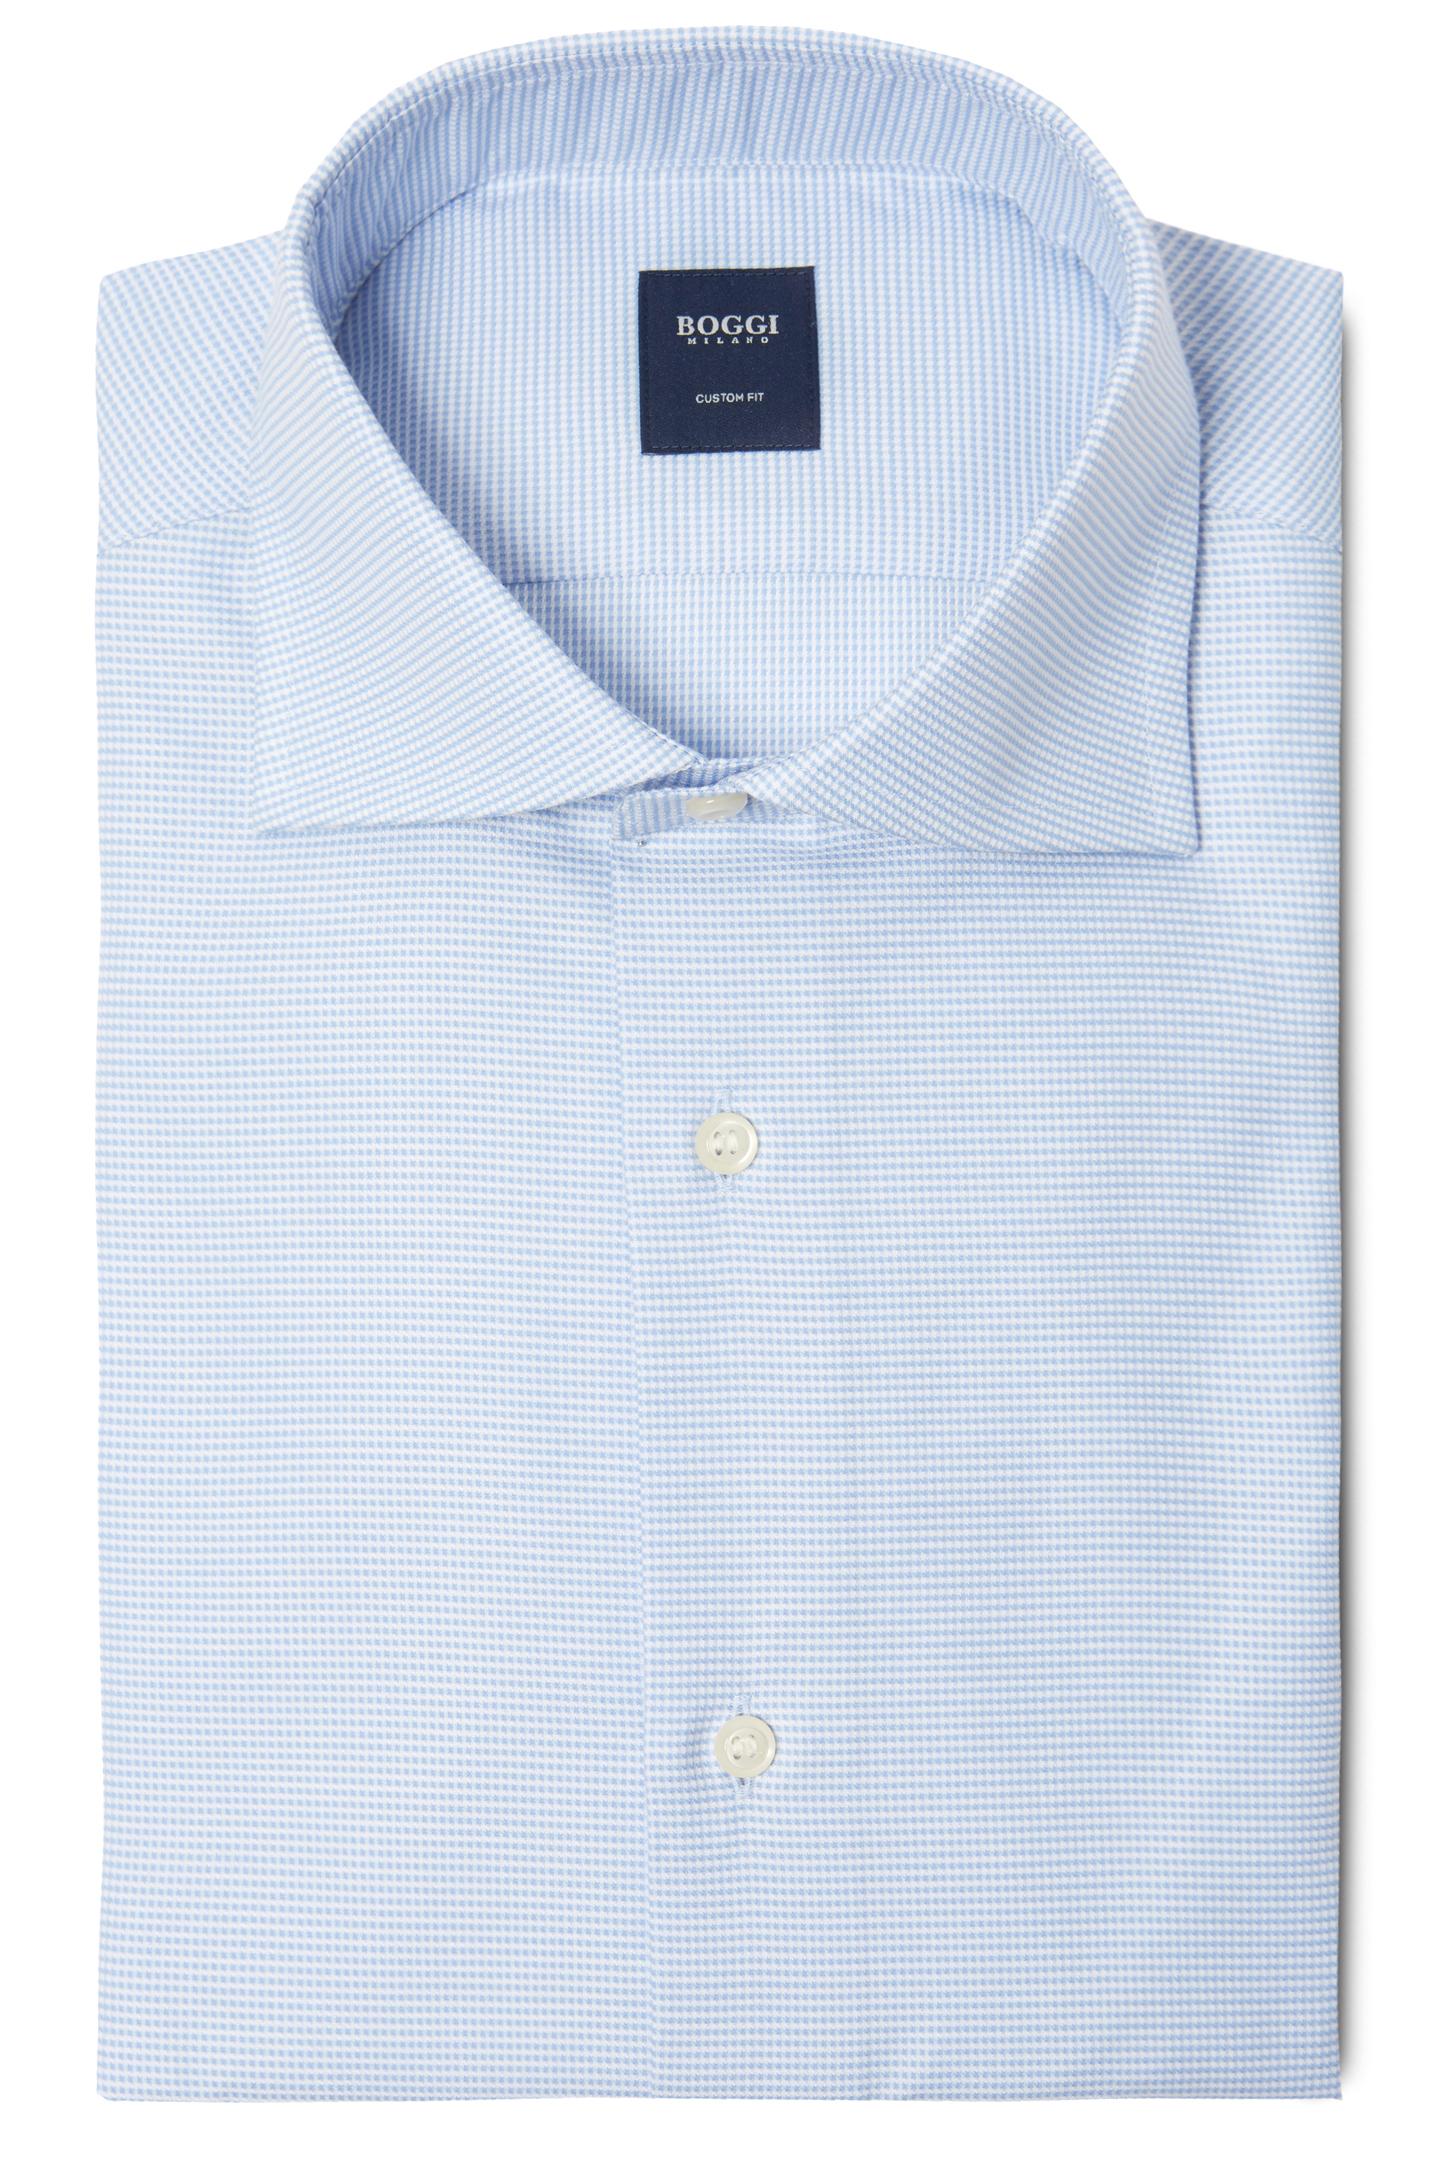 Custom Fit Textured Cotton Shirt With Windsor Collar Light Blue Boggi